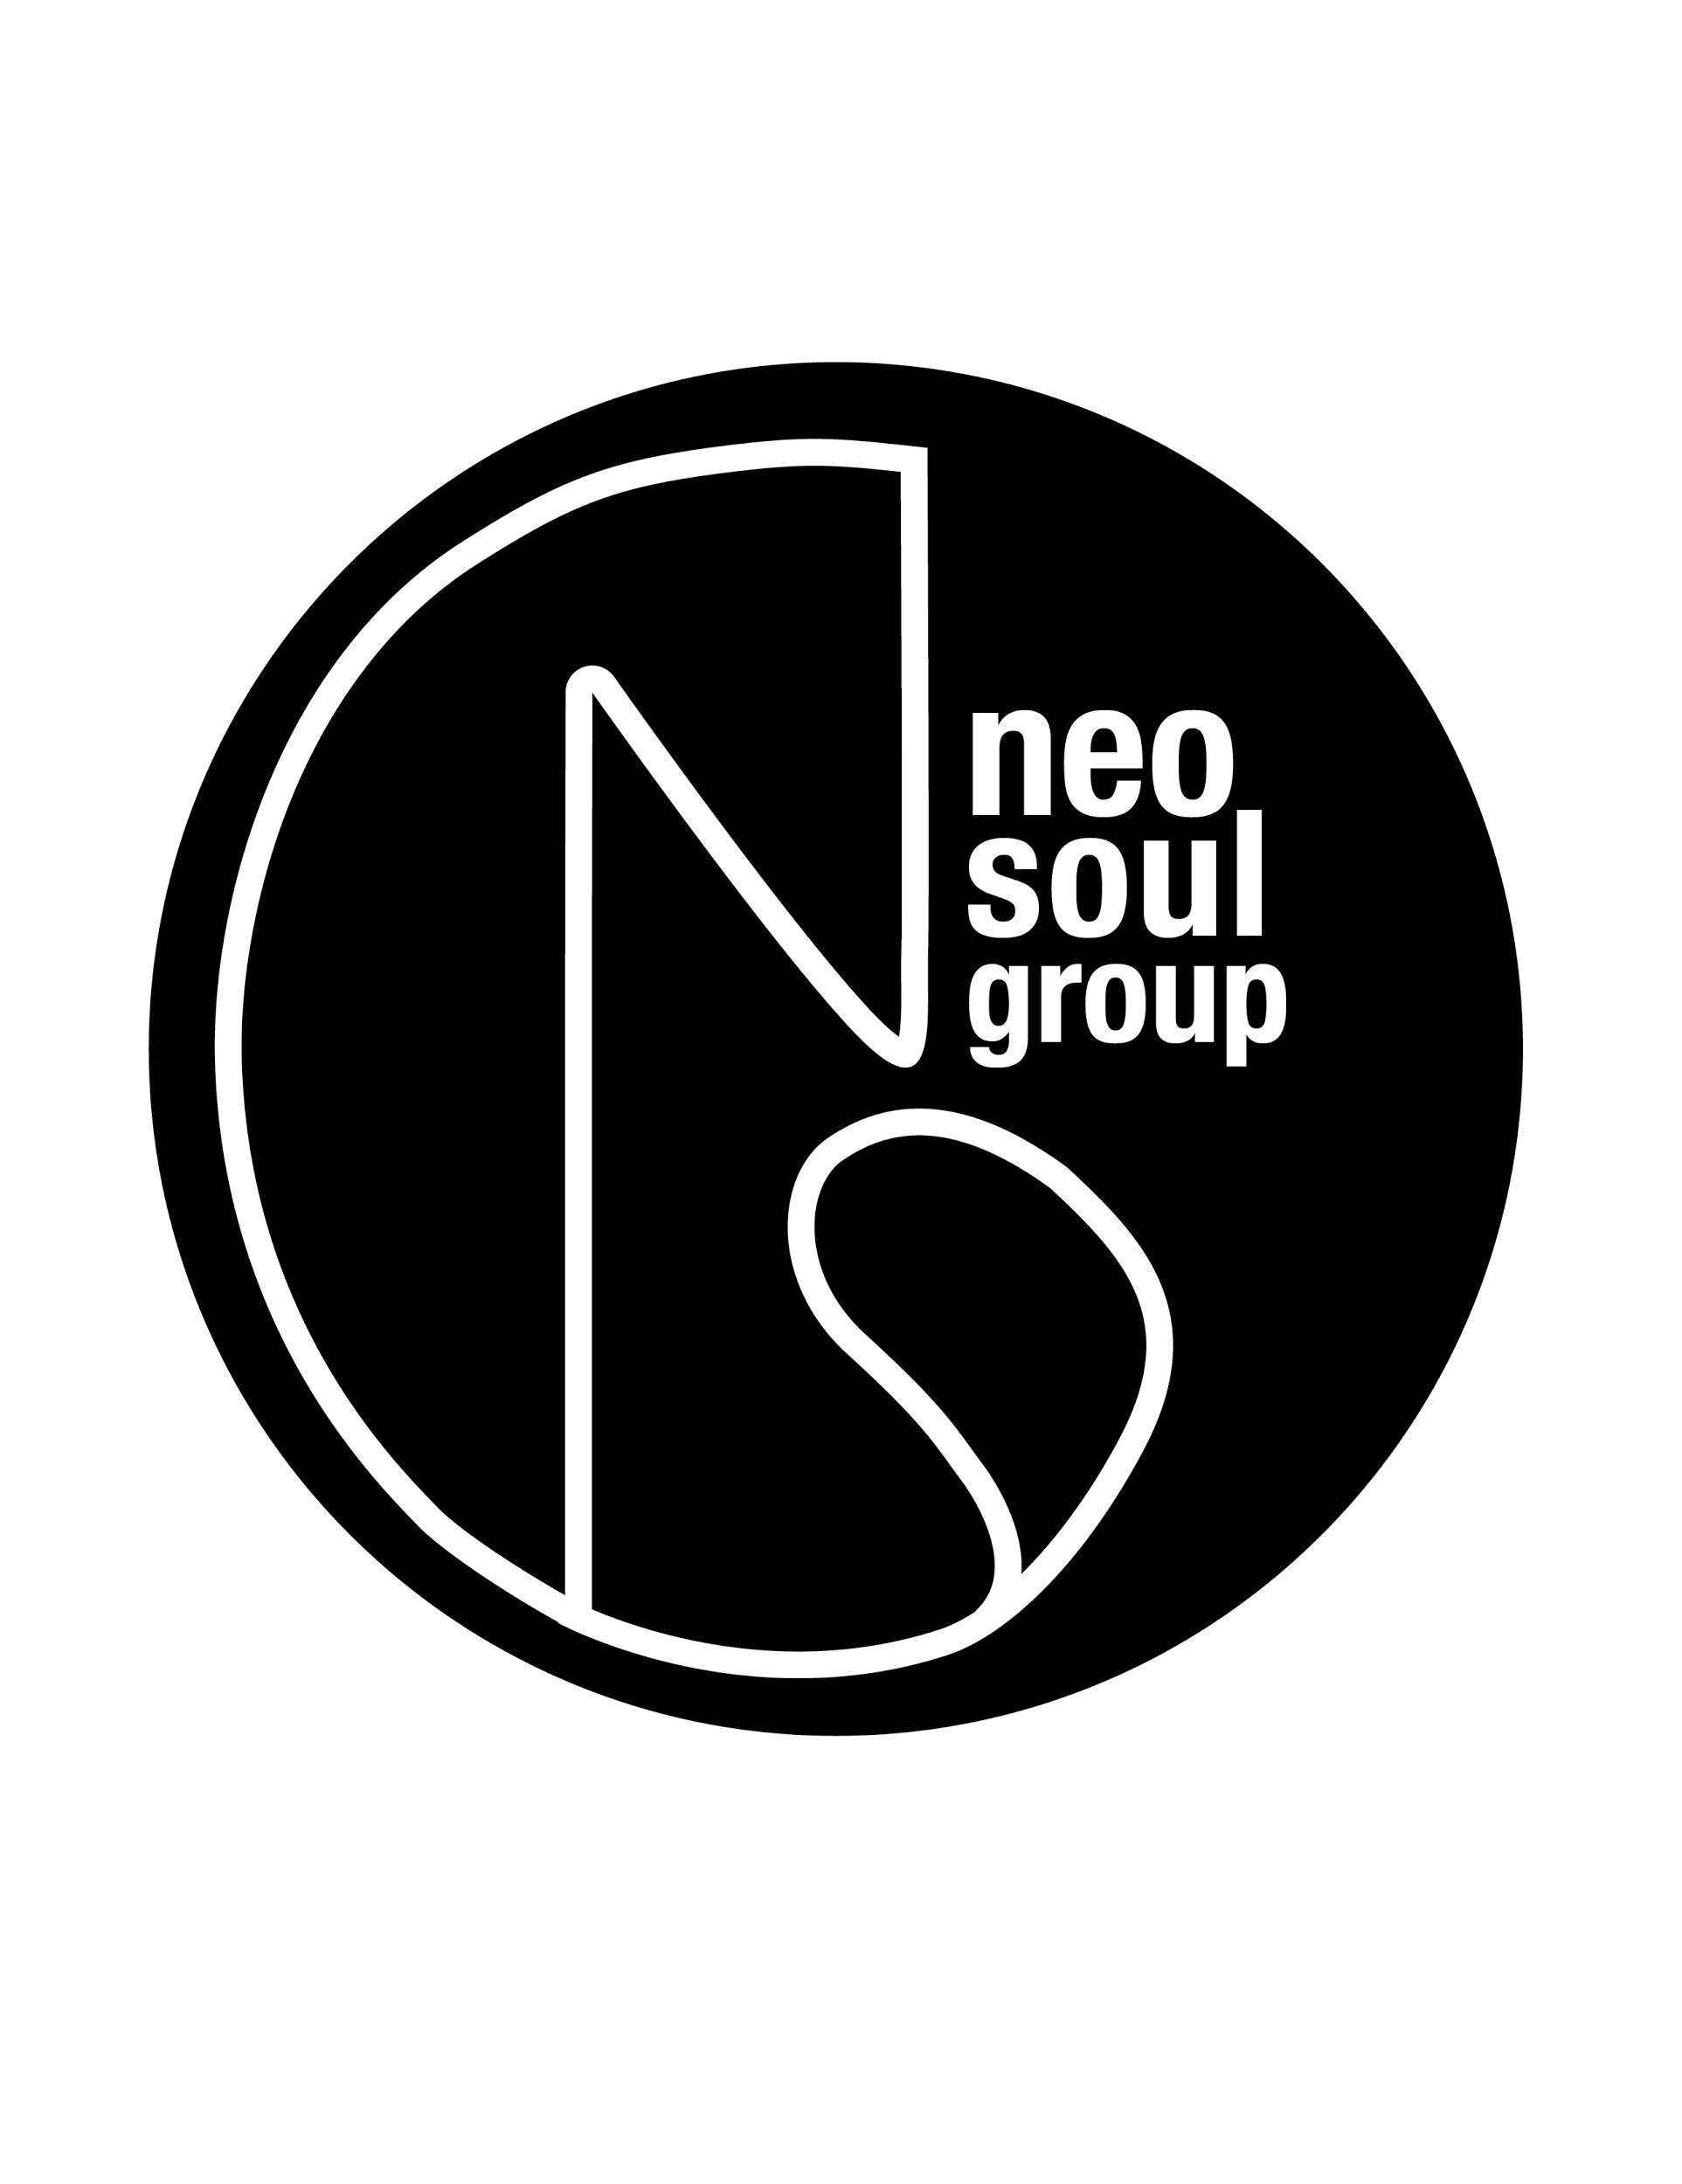 Neo Soul Group logo_Malcolm Richardson.jpg